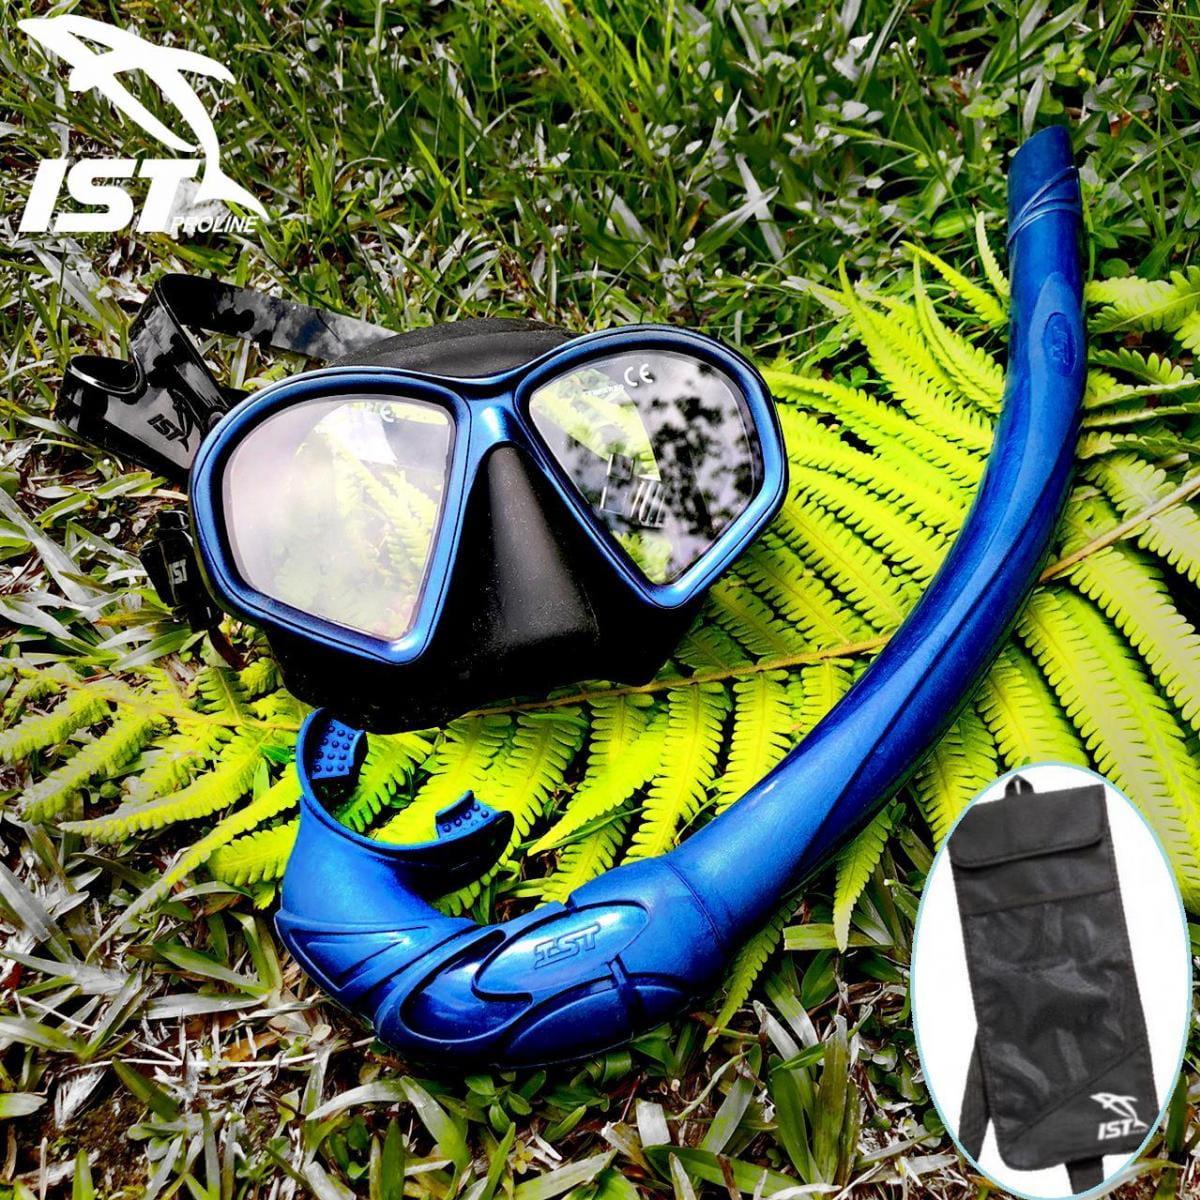 【IST】CS36 - HUNTER自由潛水新手套組 - 加贈環保網袋 1